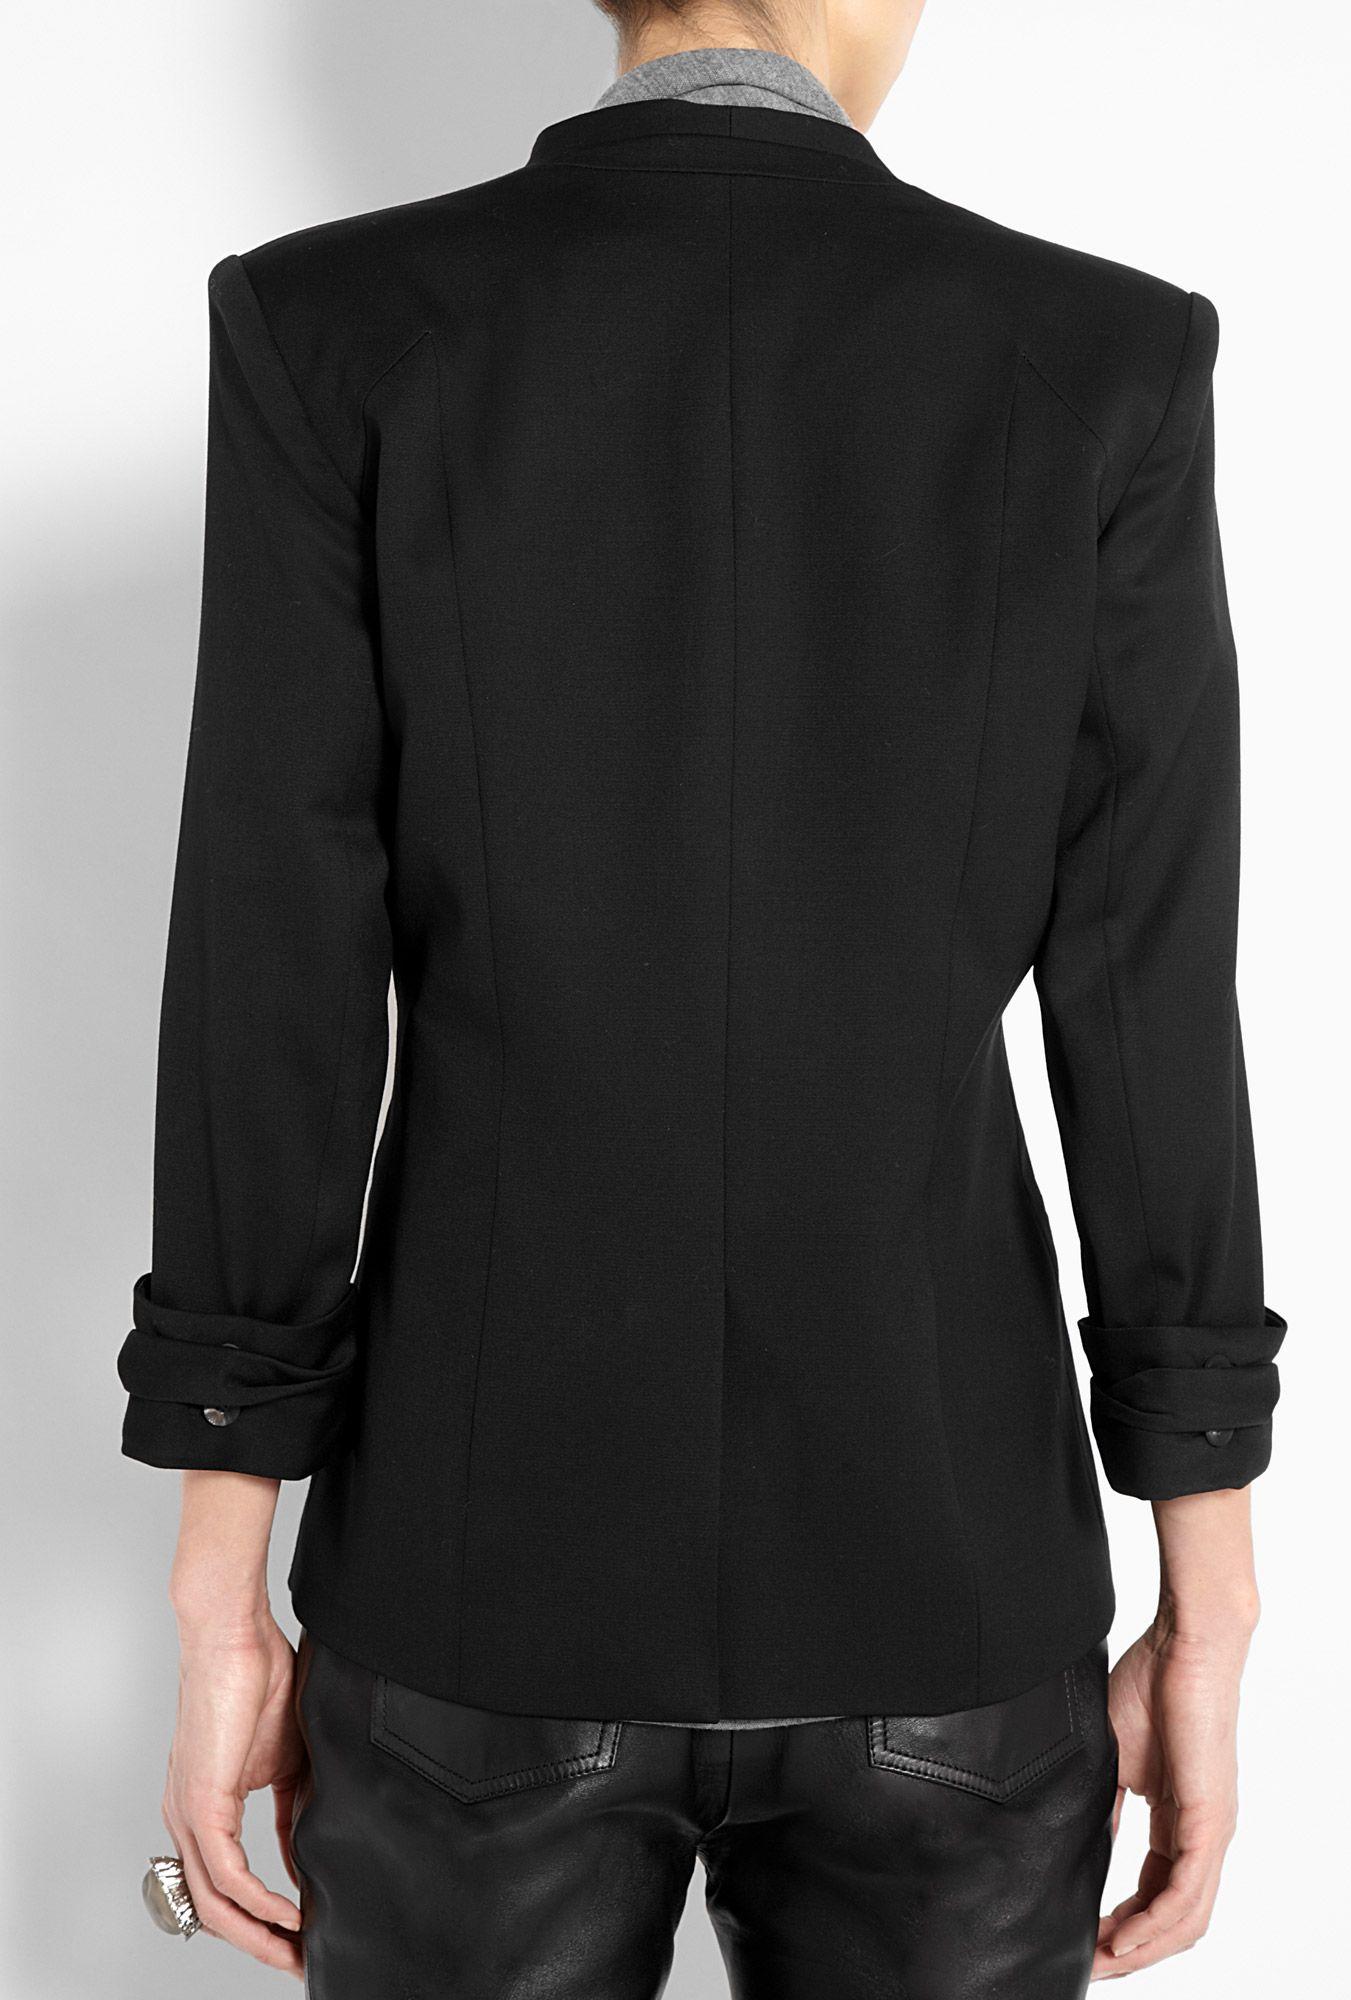 Helmut Lang  Black Double Breasted Smoking Jacket back